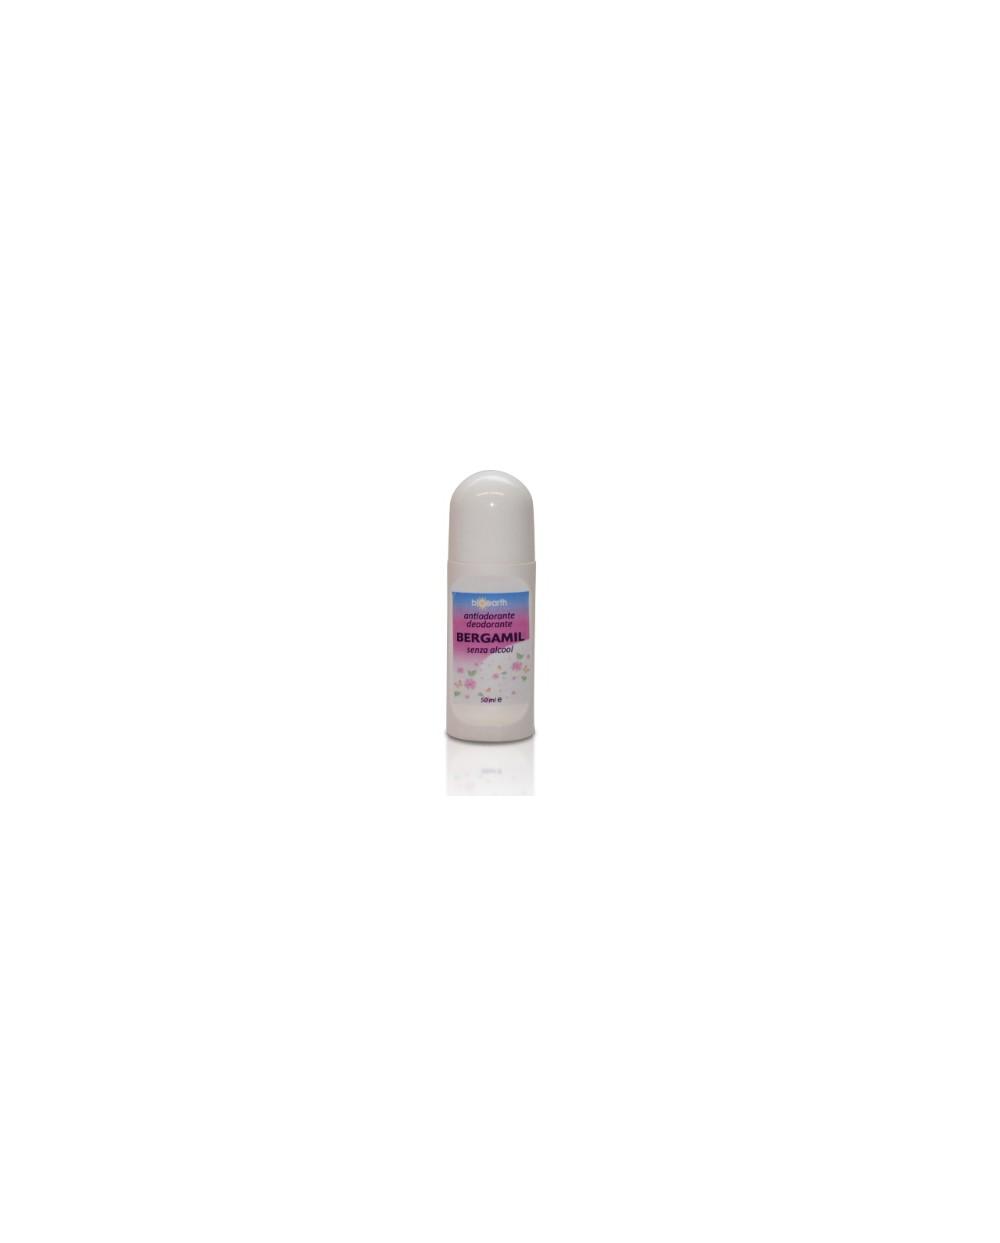 Bioearth - Bergamil - Antiodorante deodorante